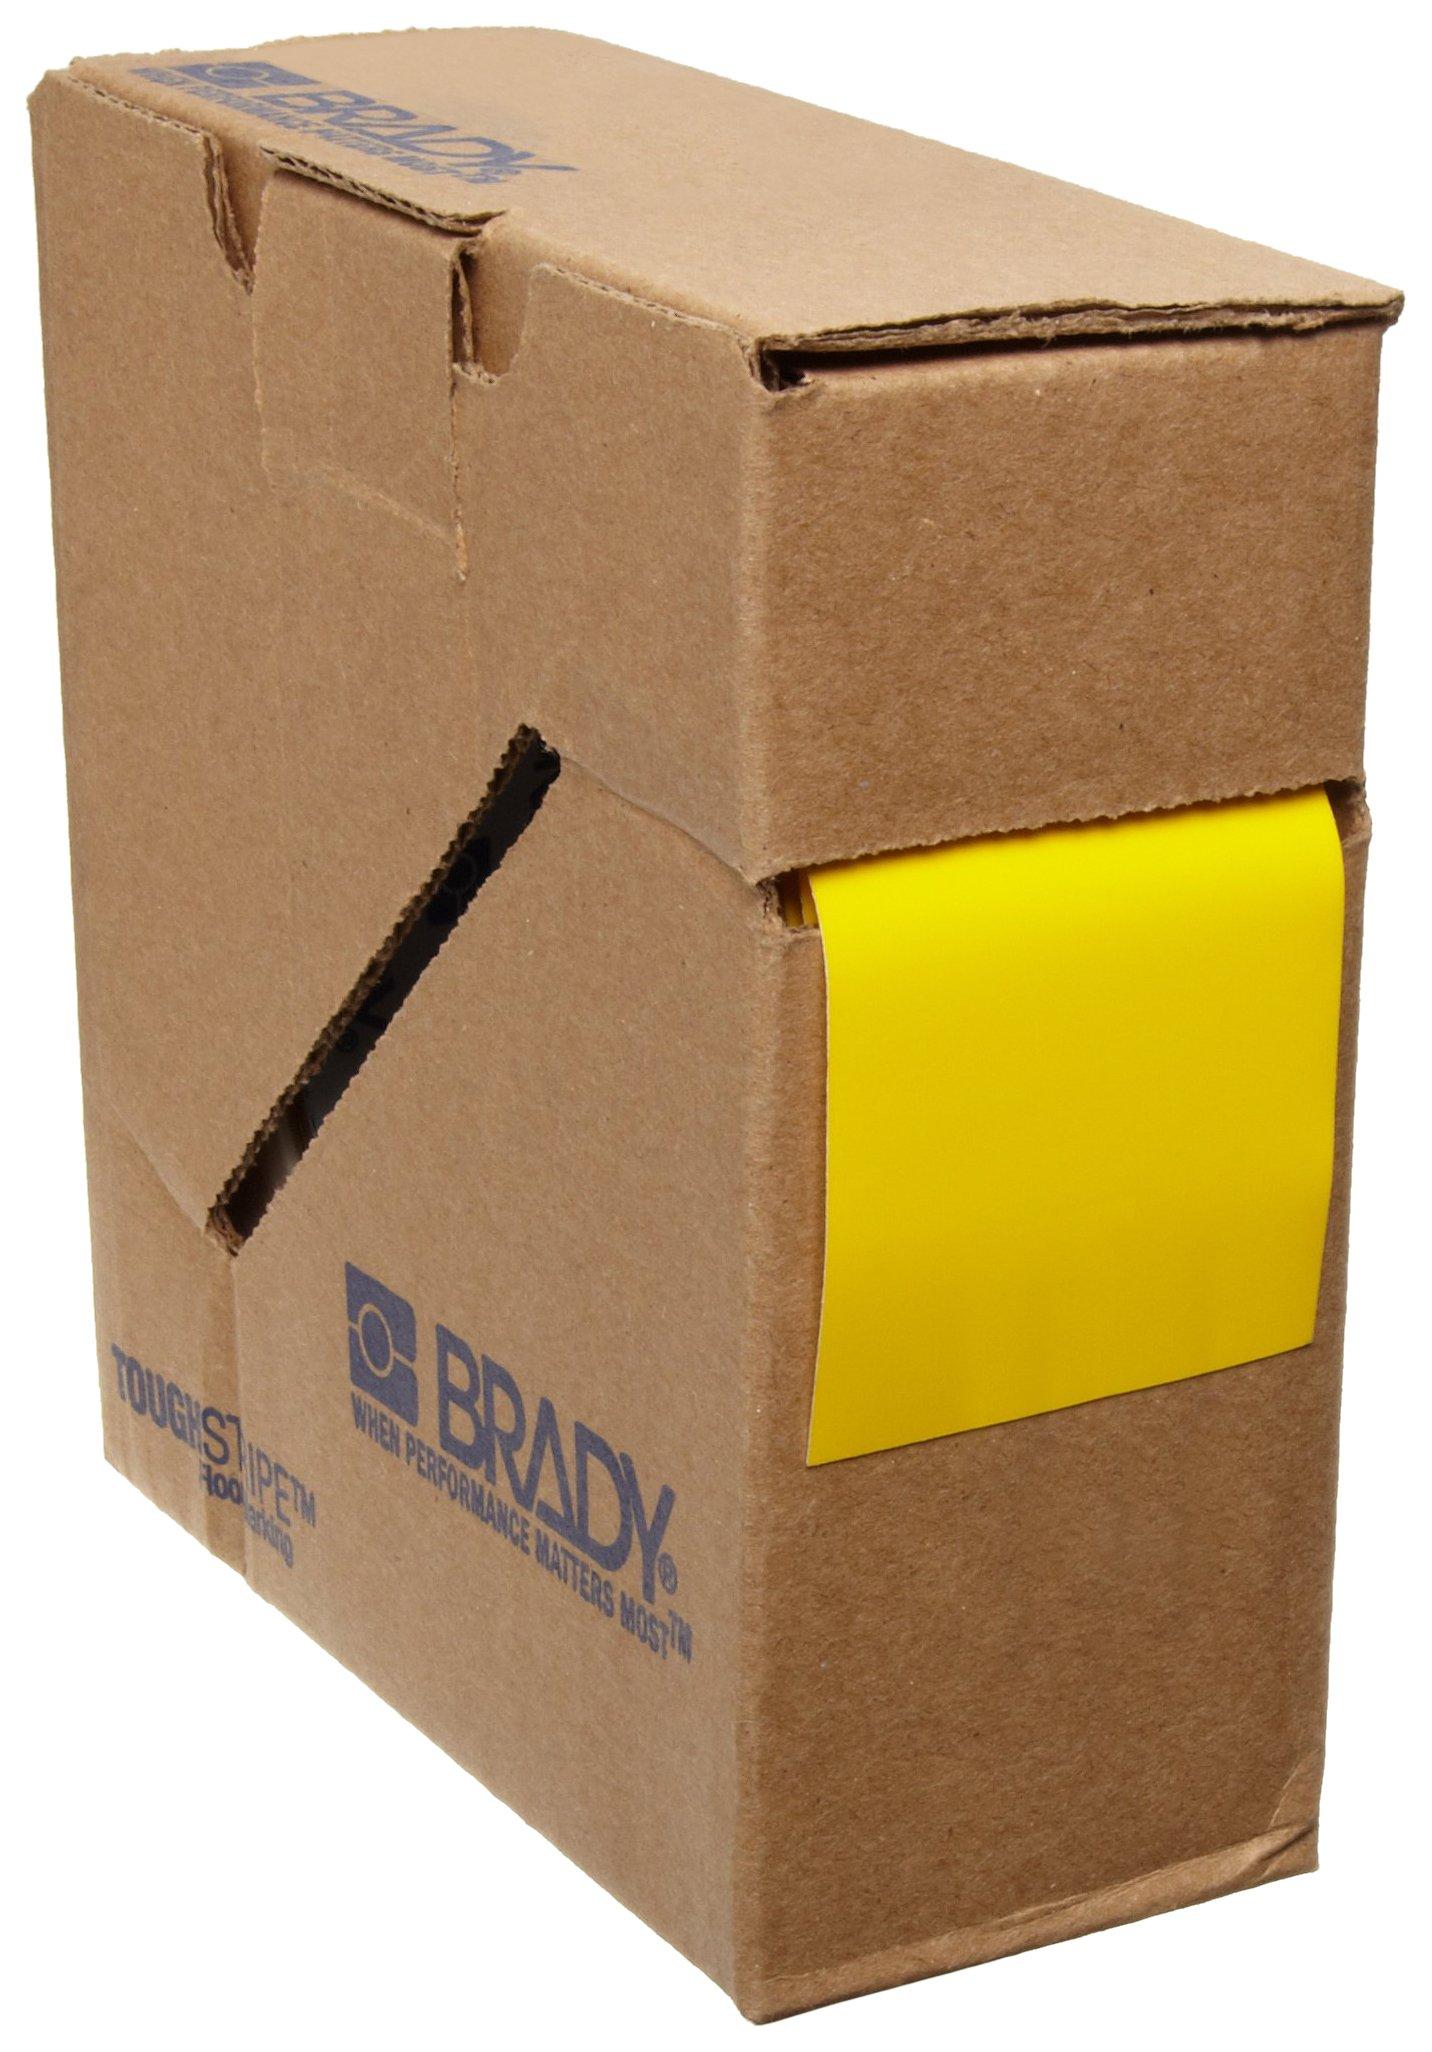 Brady ToughStripe Floor Marking Tape - Yellow, Non-Abrasive Tape - 2'' Width, 100' Length - 104312 by Brady